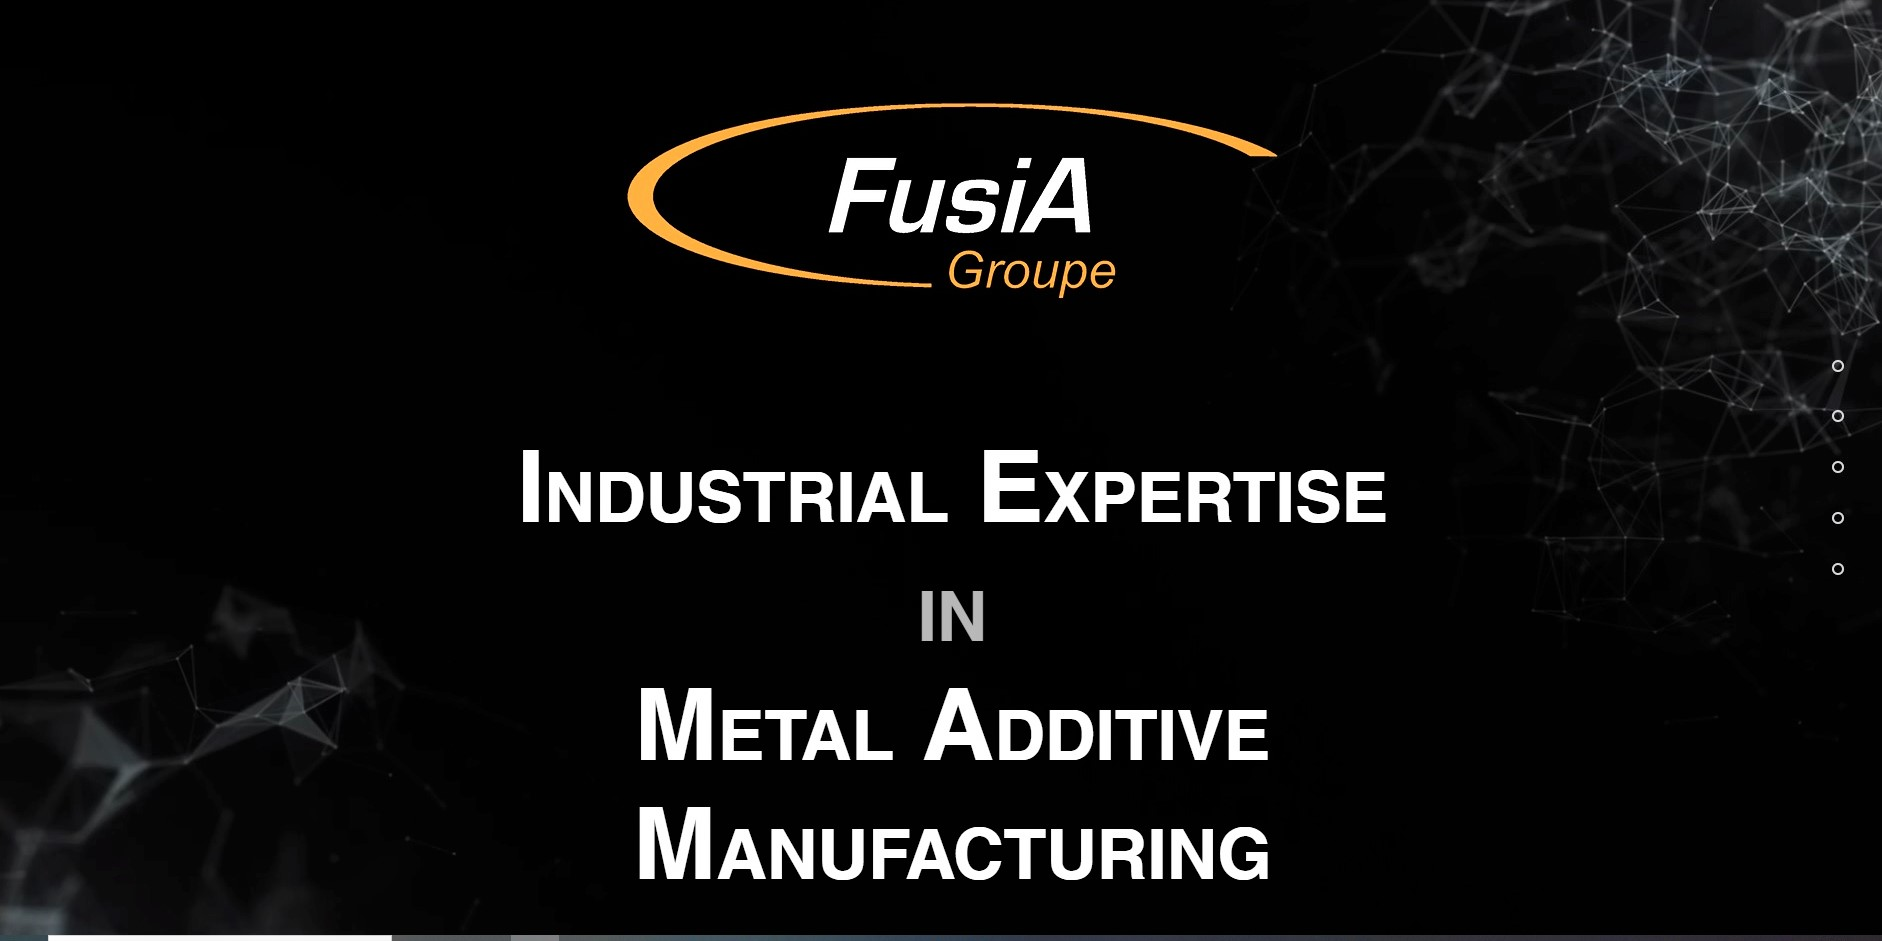 https://www.fusia-groupe.com/